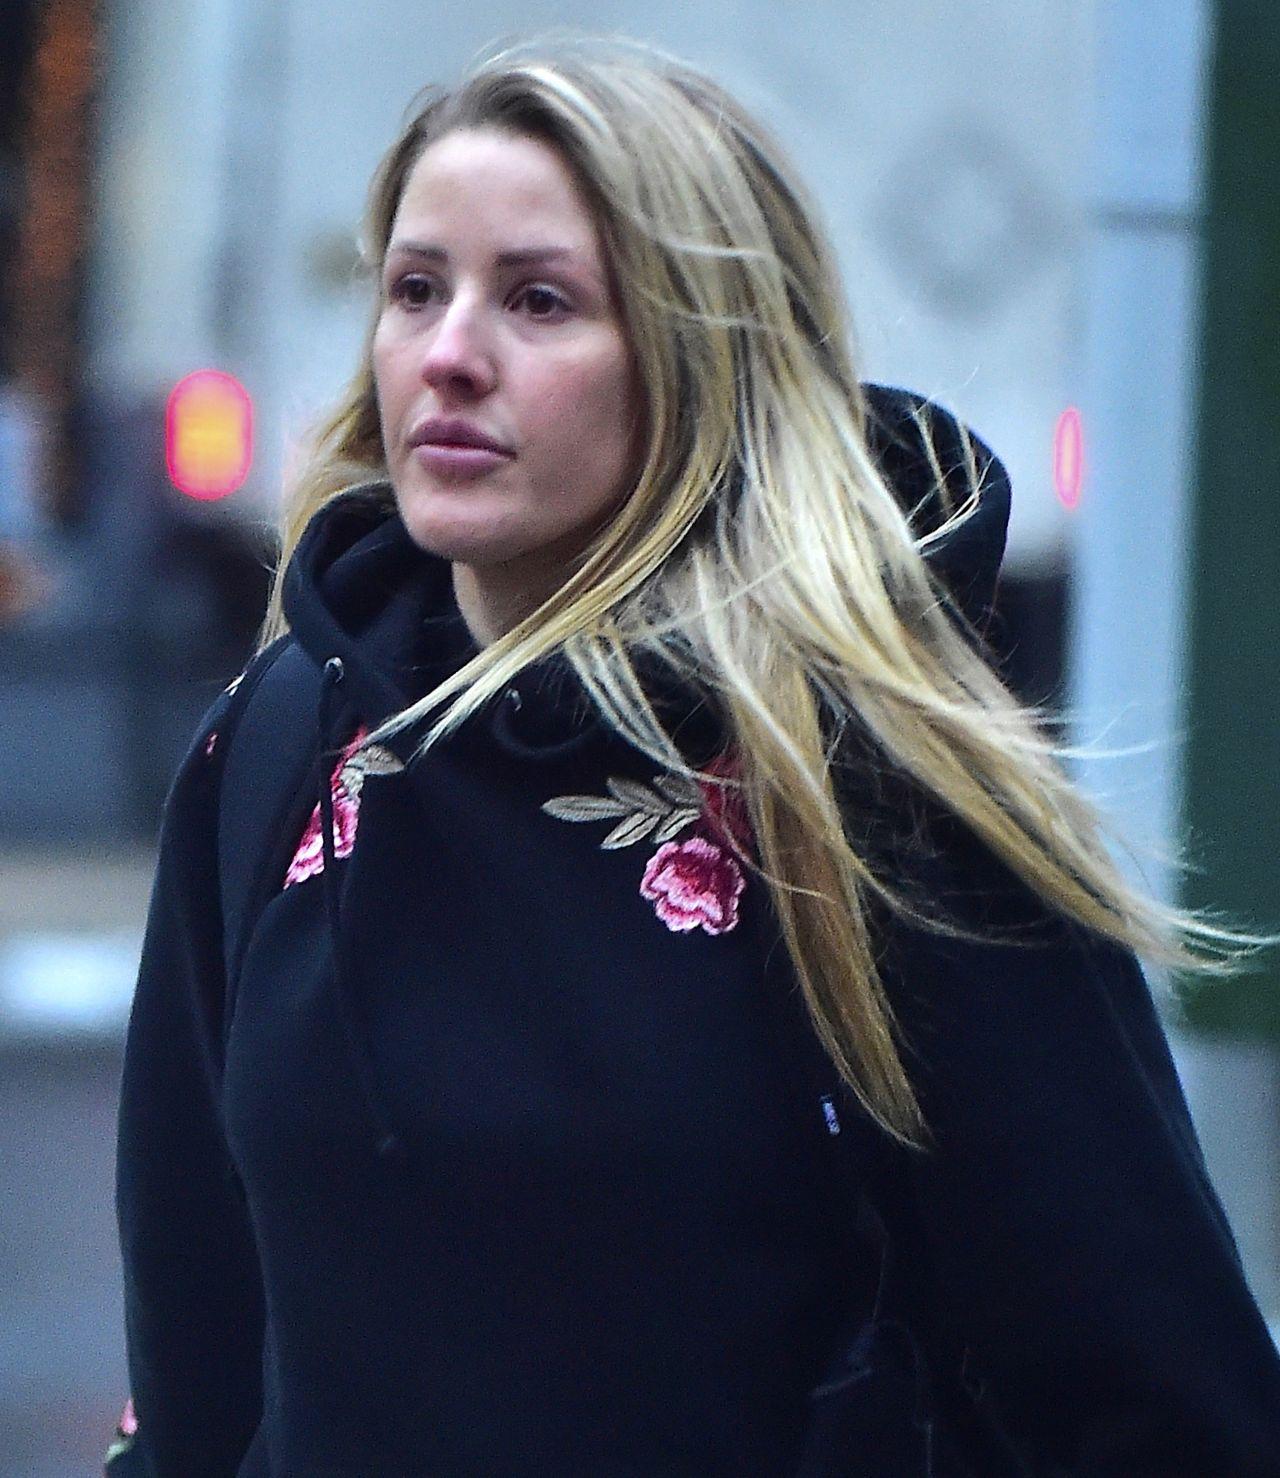 Ellie Goulding Shopping In New York City 01 10 2018